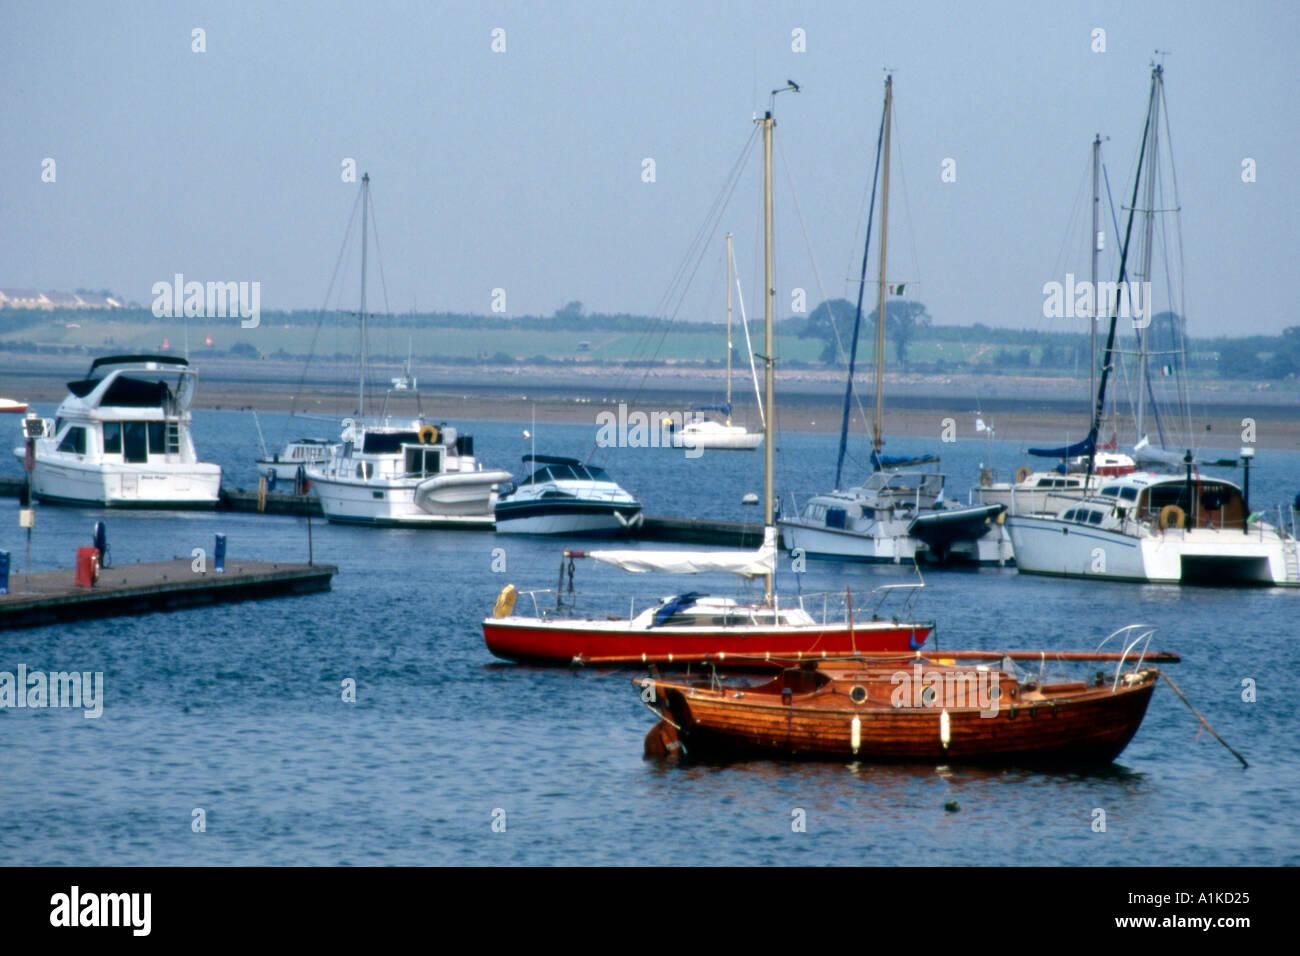 Malahide harbour Ireland - Stock Image